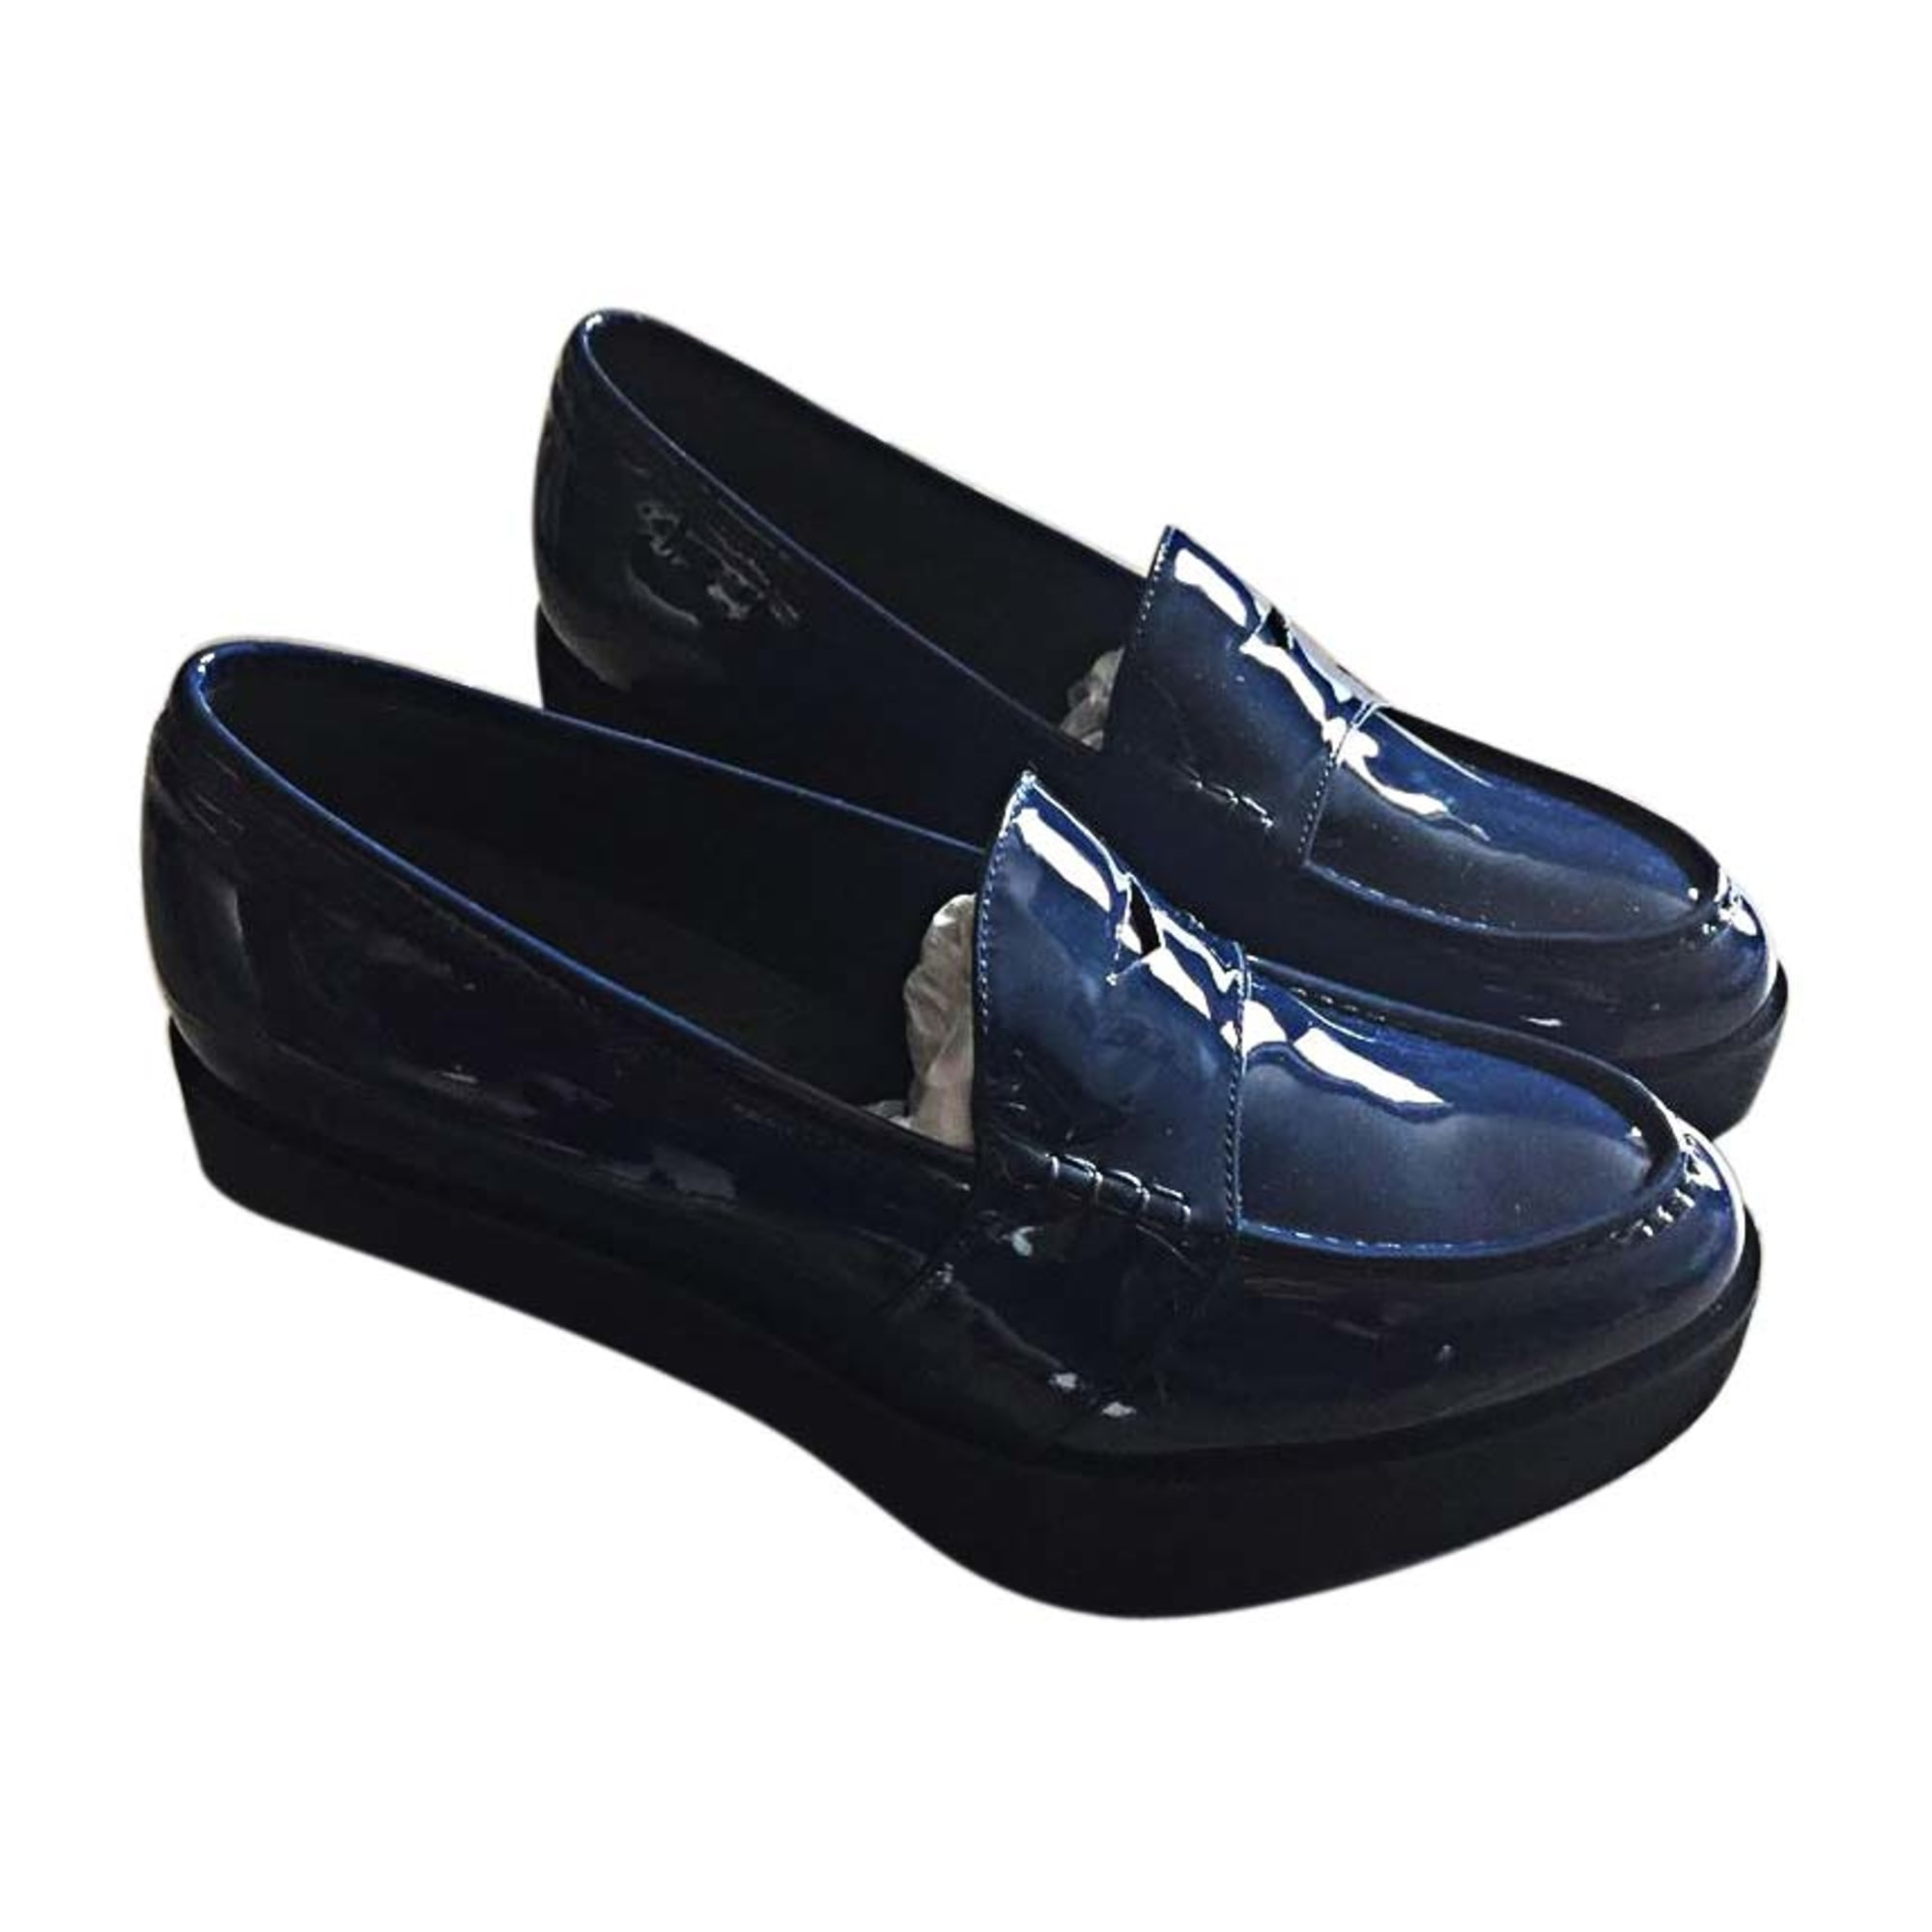 Mocassins FRATELLI ROSSETTI Bleu, bleu marine, bleu turquoise